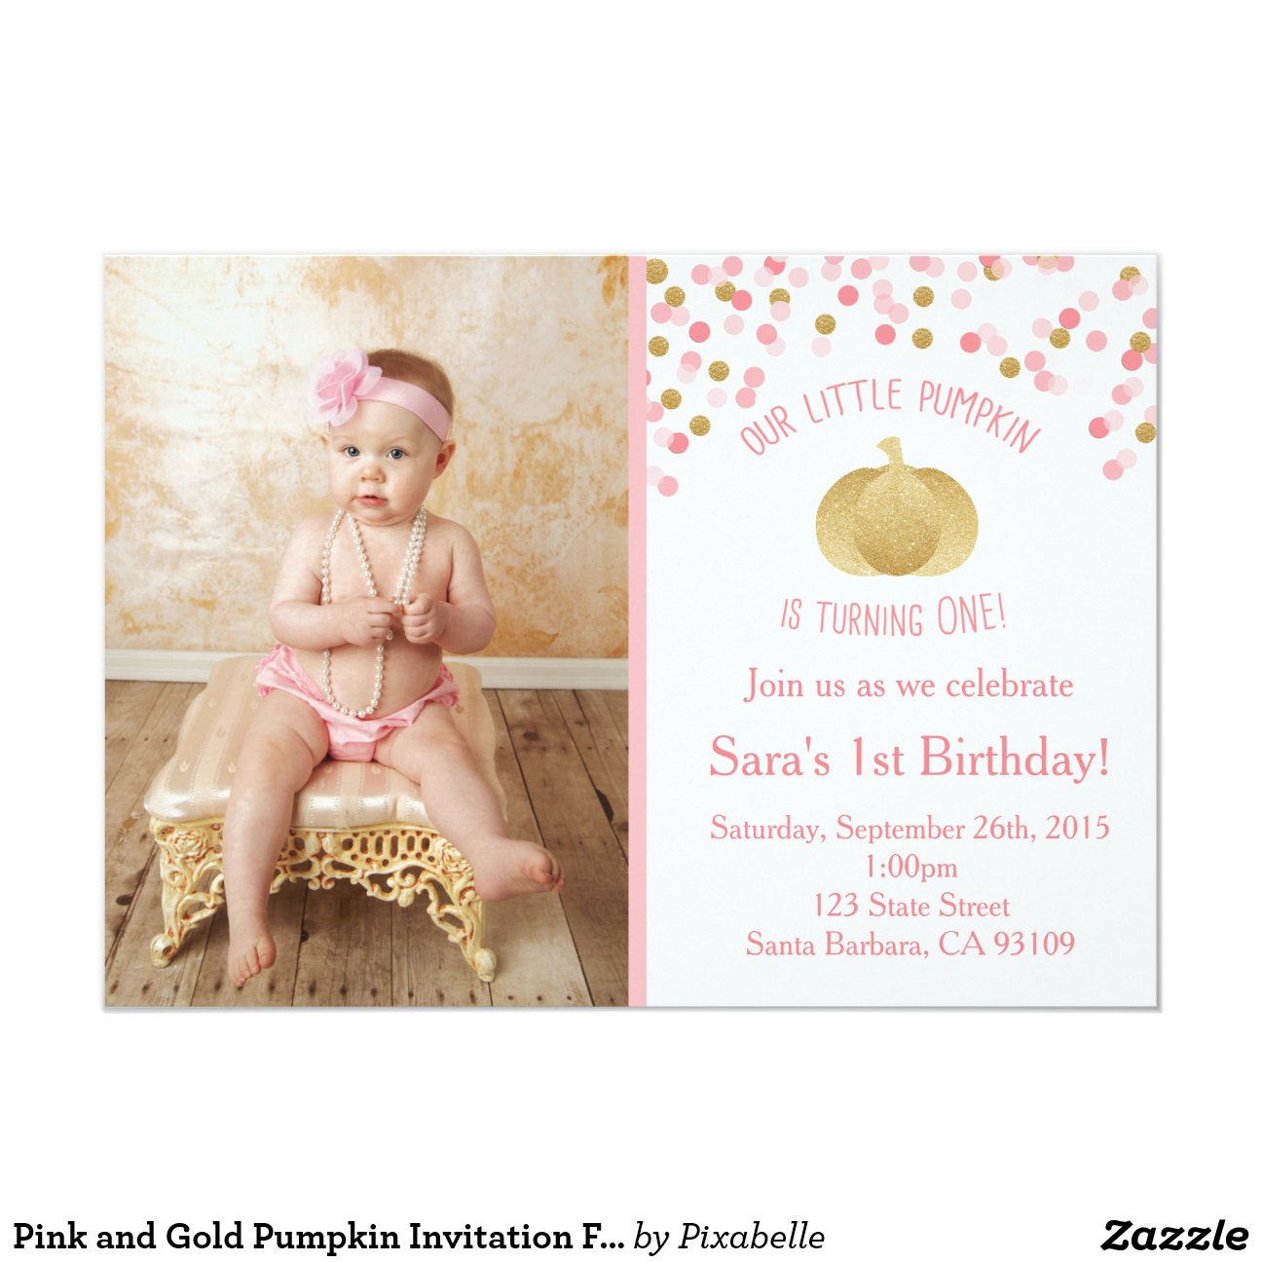 pink_and_gold_pumpkin_invitation_first_birthday ...